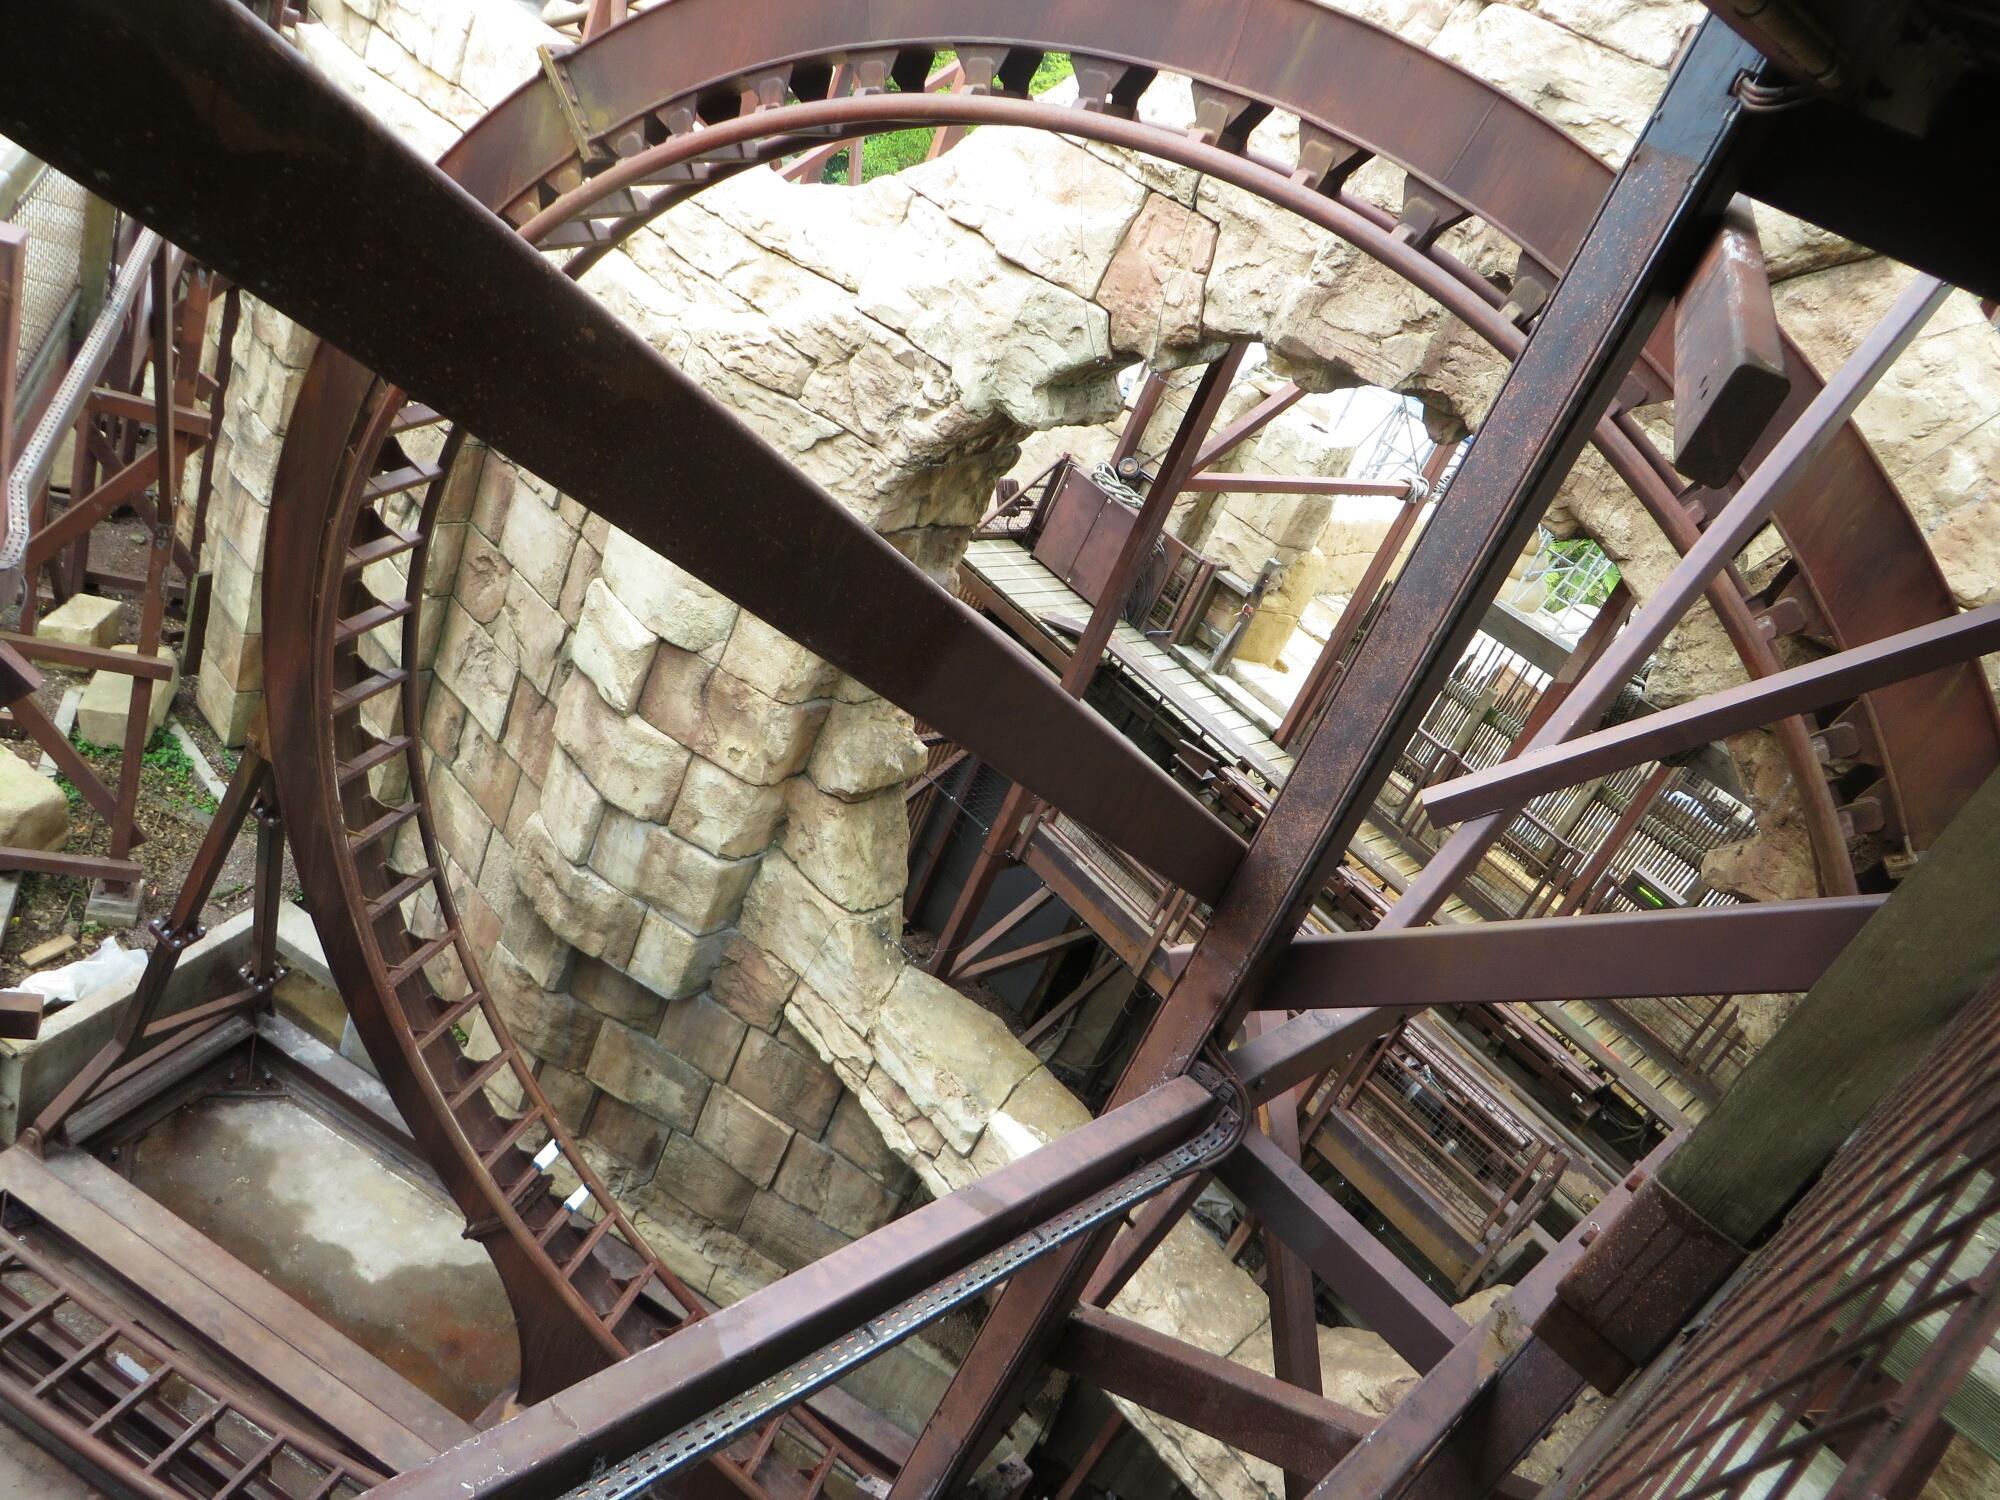 Indiana Jones™ et le Temple du Péril - Réhabilitation [Adventureland - 2014] - Page 13 BnghfRfIAAE7jfE